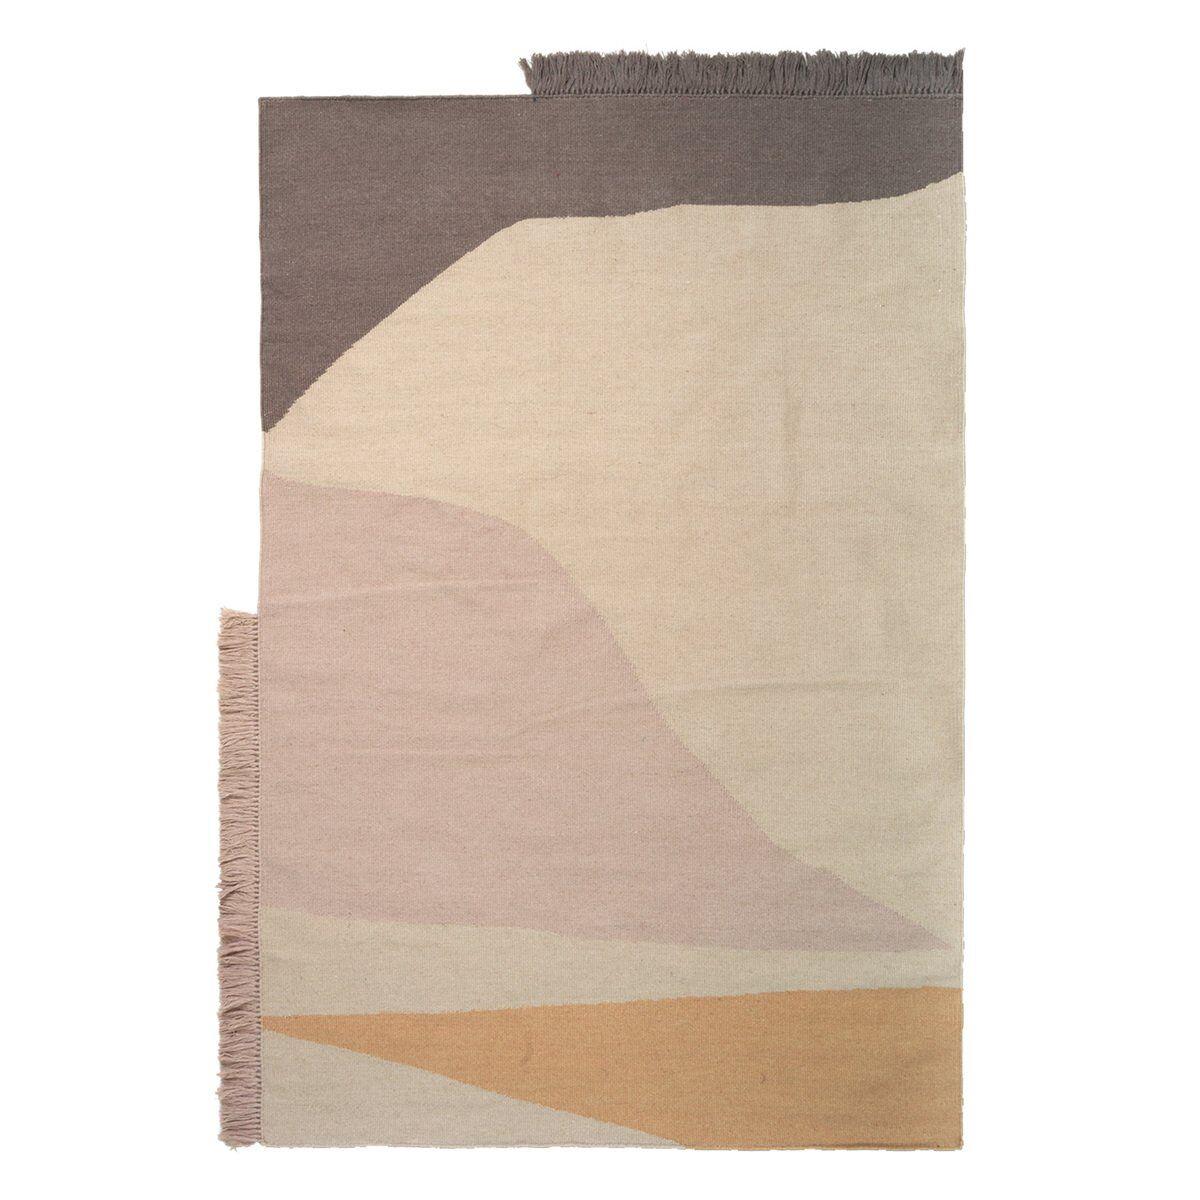 Image of Ferm Living Kelim matto, Earth, 140 x 200 cm